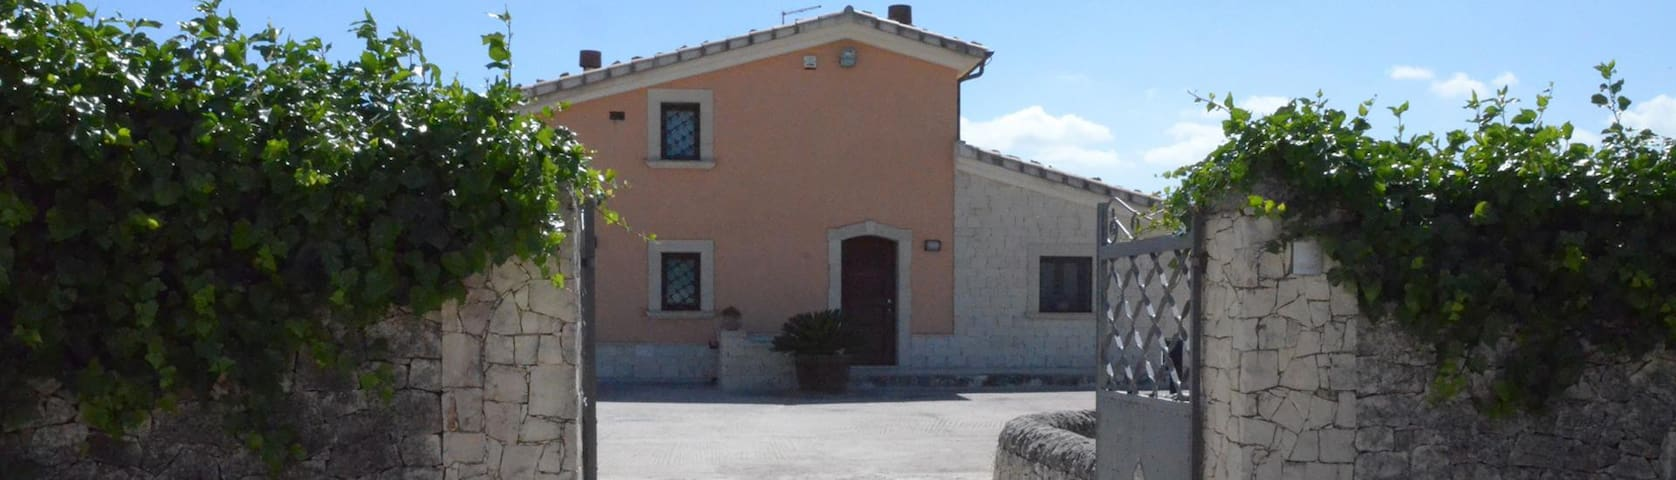 Villa Collina degl' Iblei - Giarratana - วิลล่า